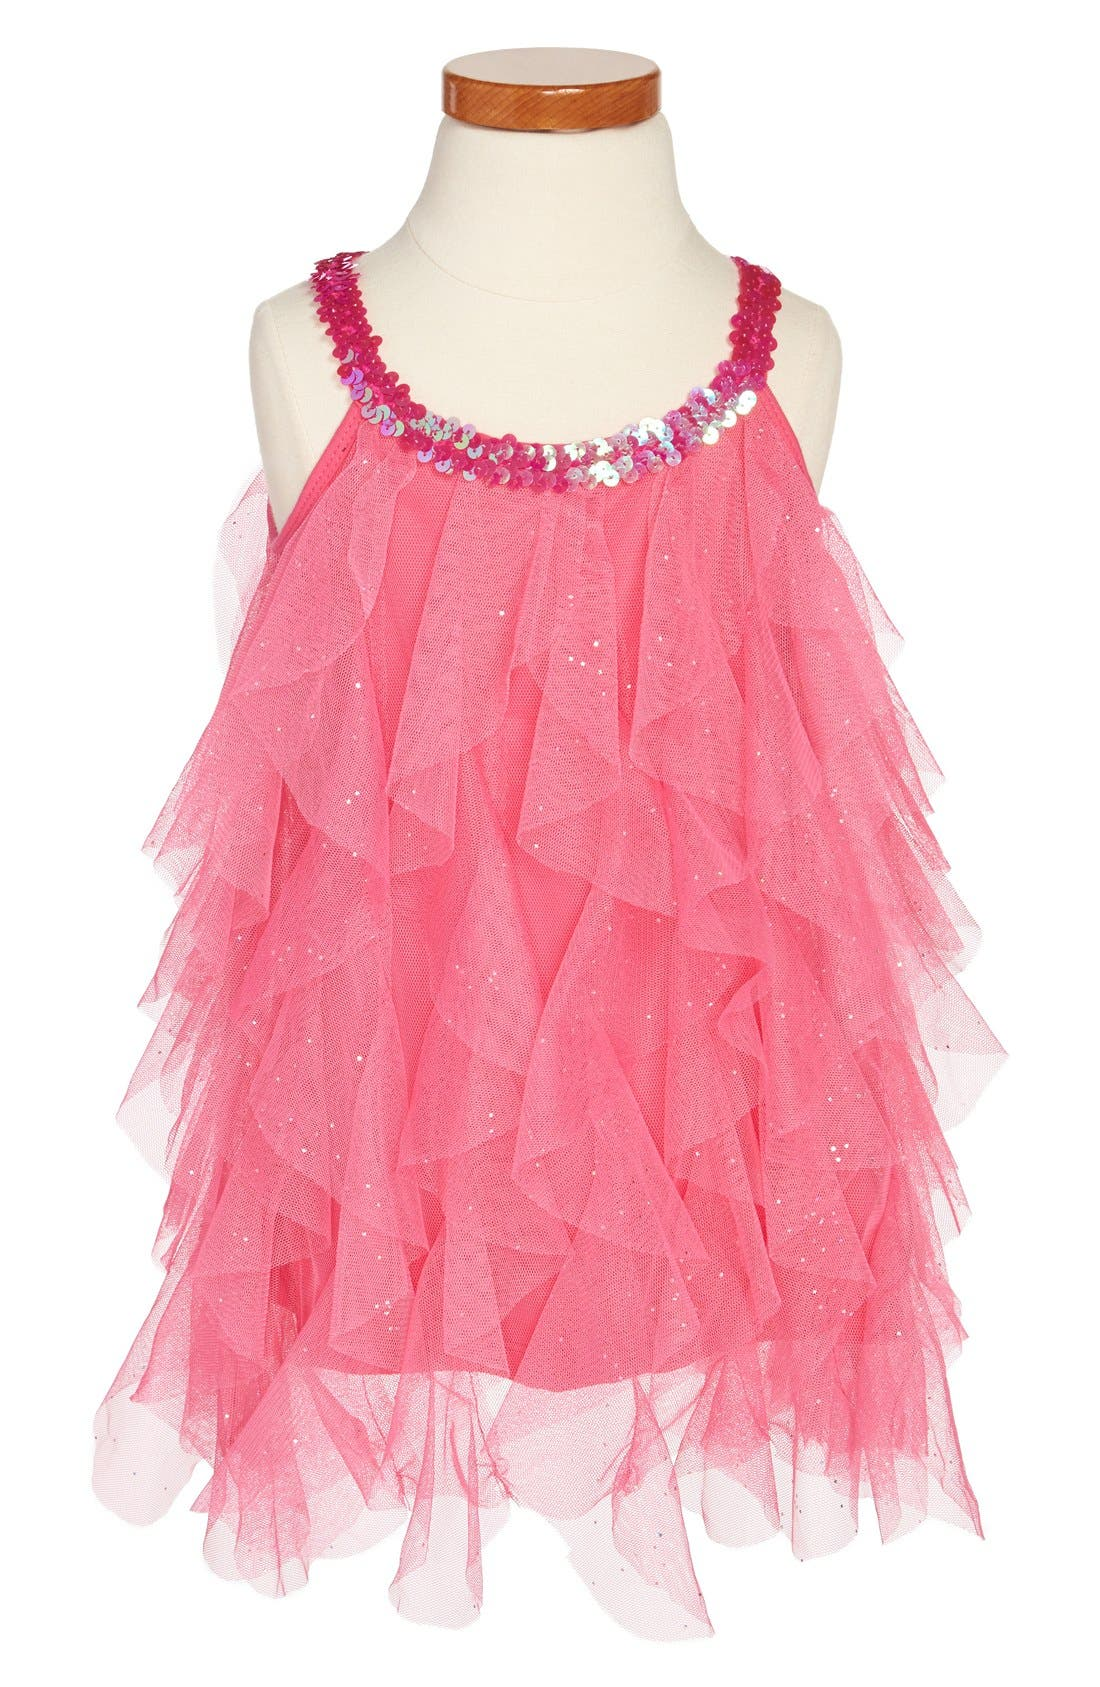 Main Image - Popatu 'Wave' Sequin Dress (Toddler Girls)